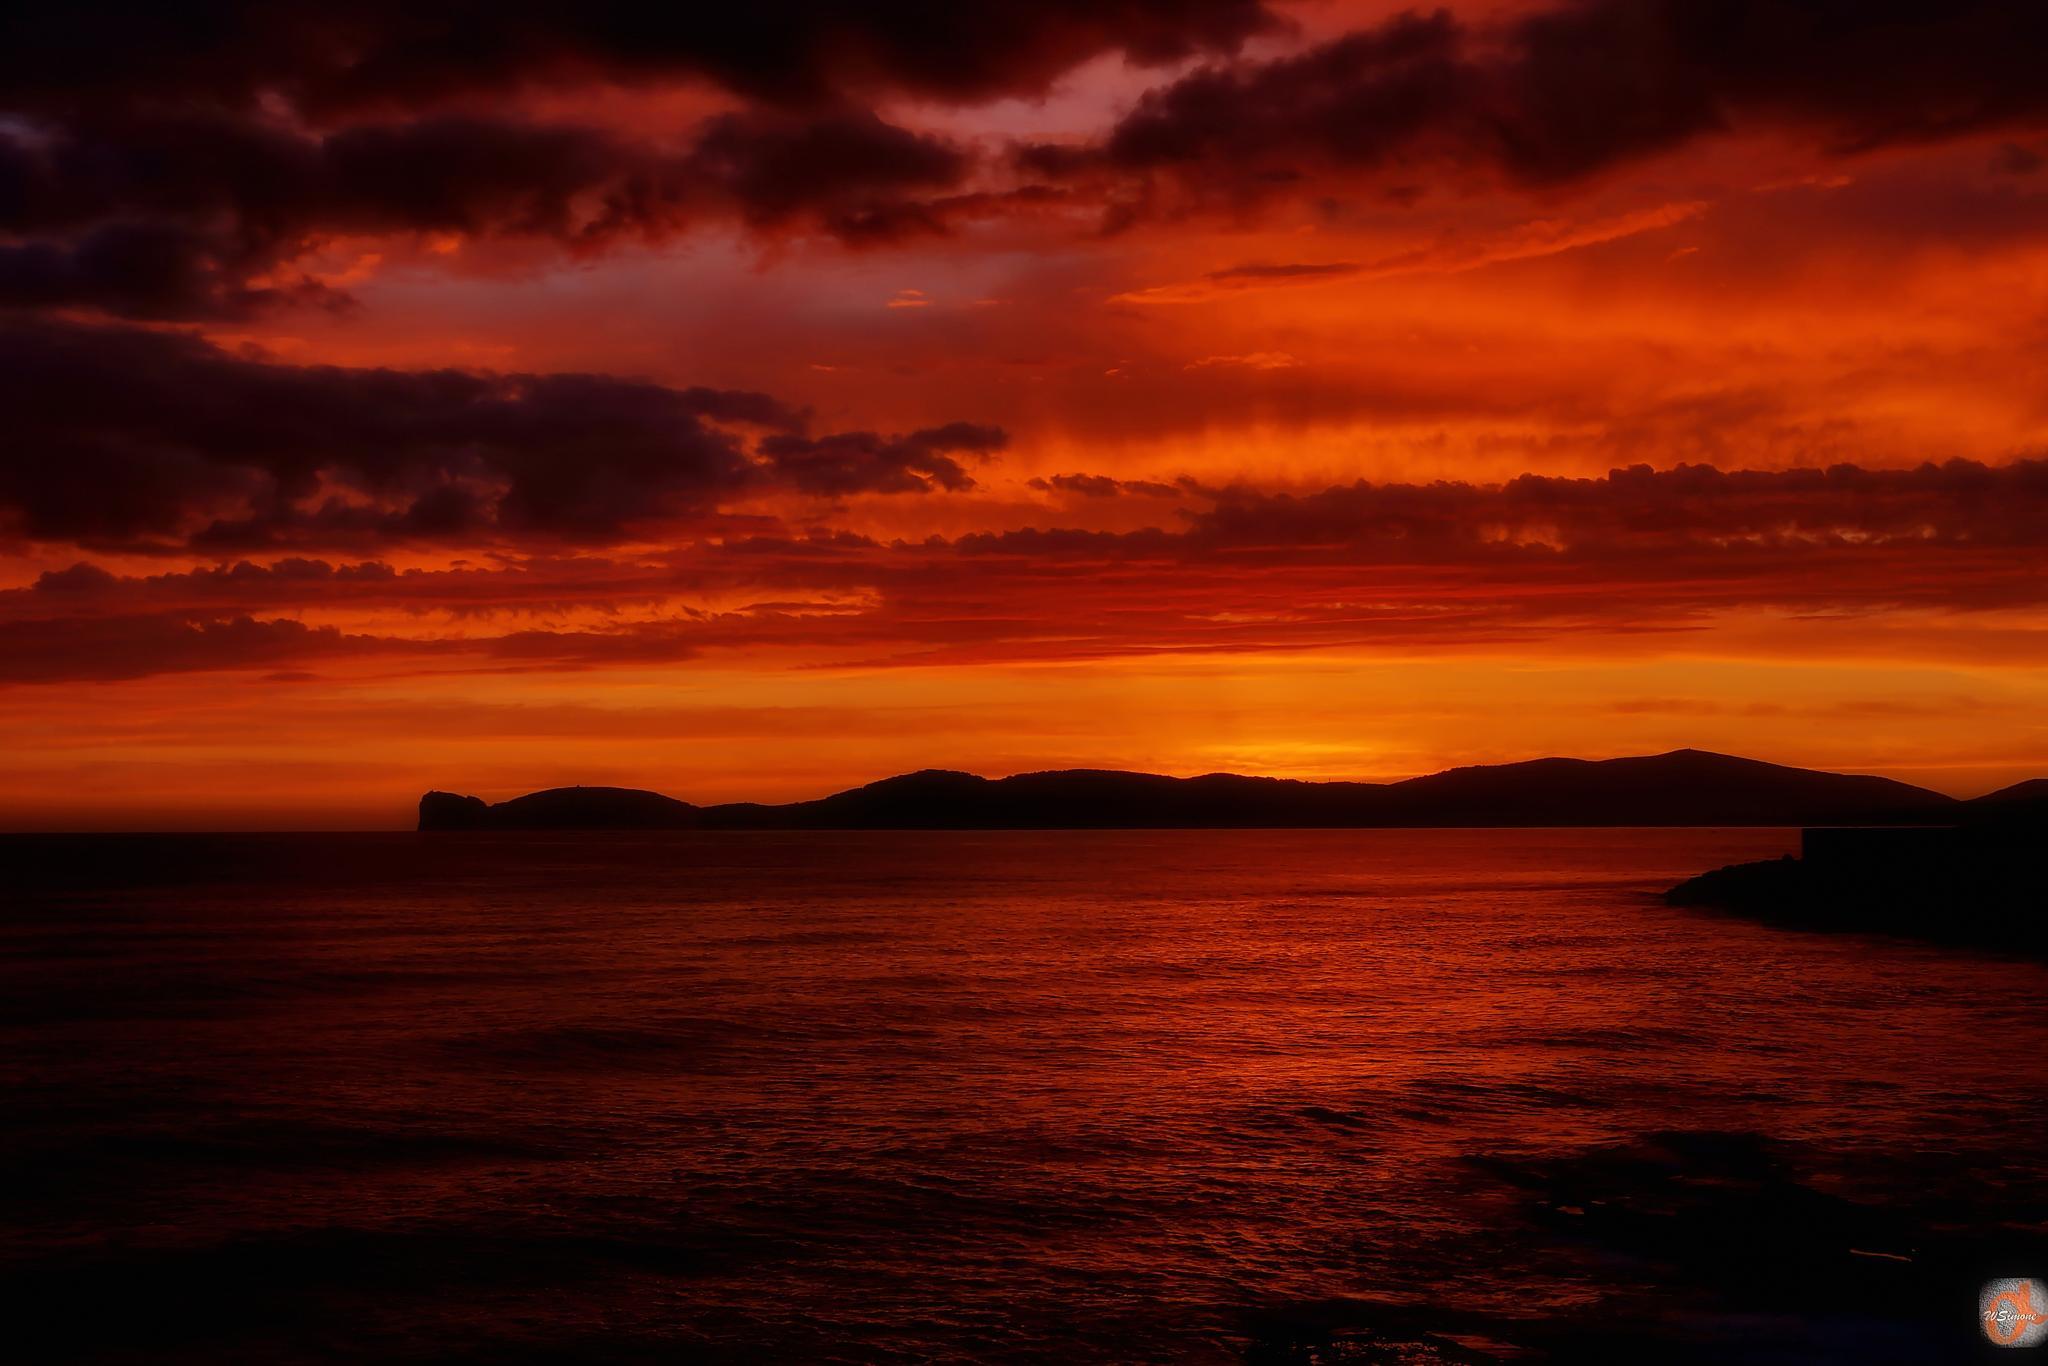 Sunset - Alghero by WSimone